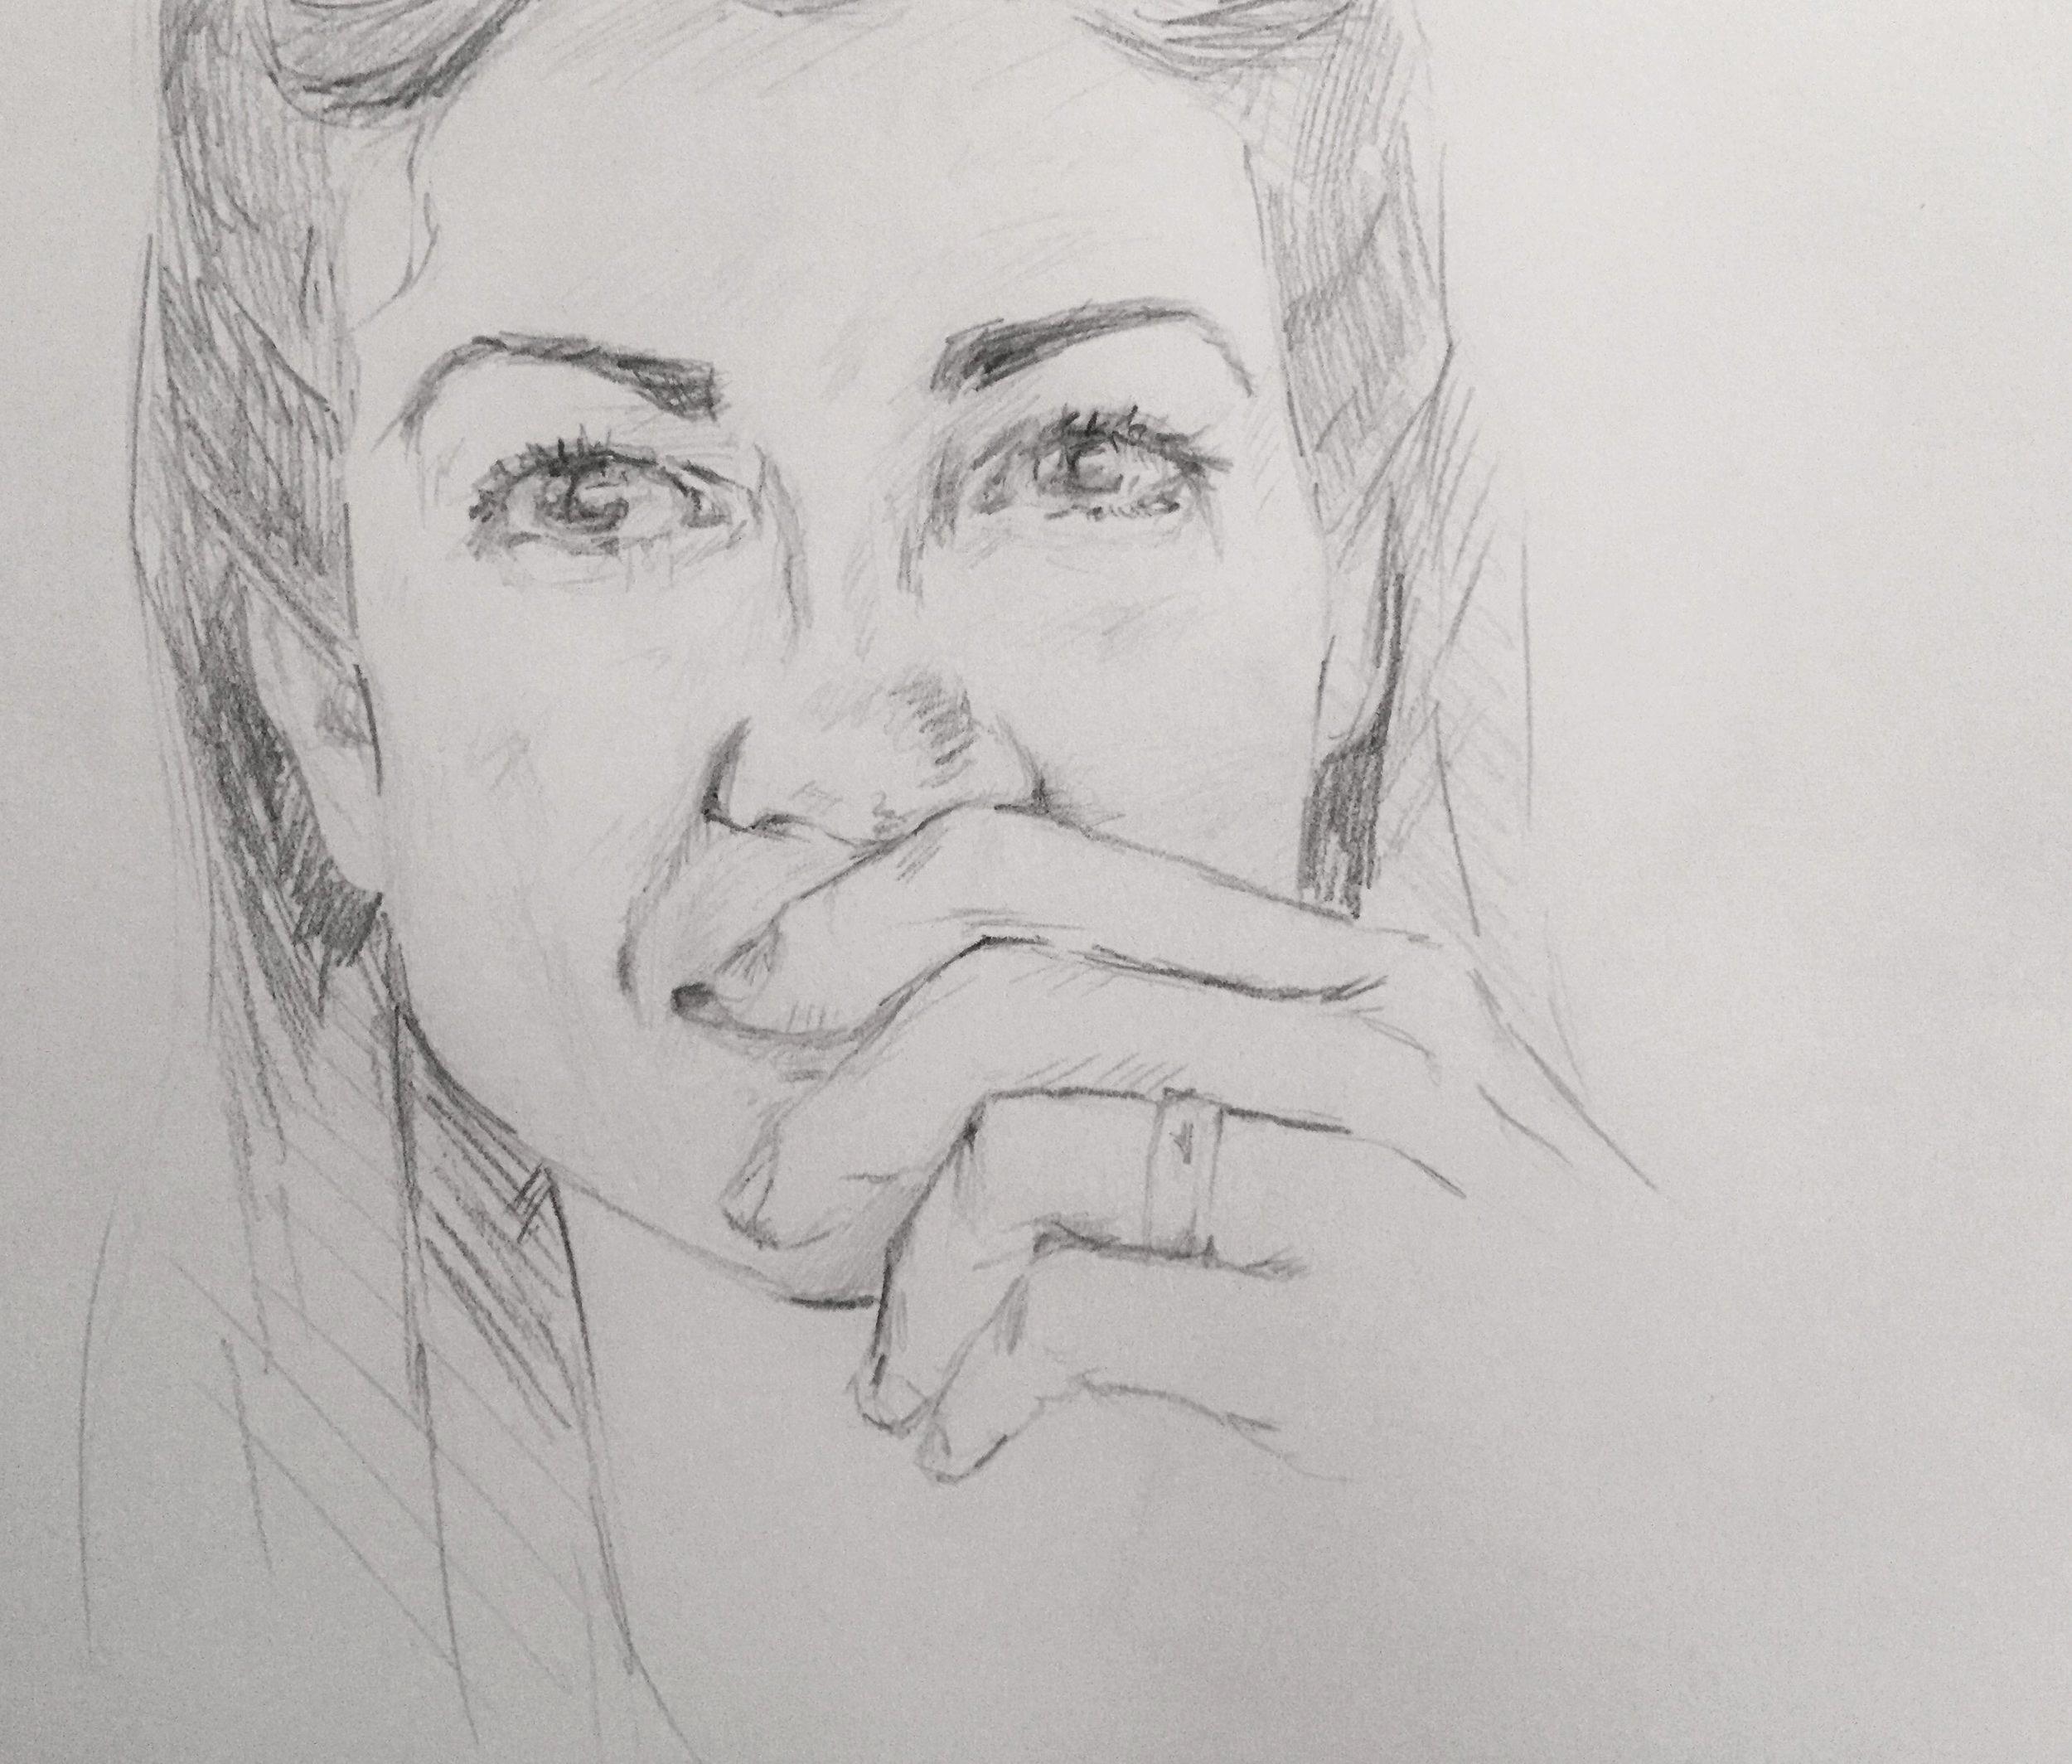 #sktchy30 ; Self portrait